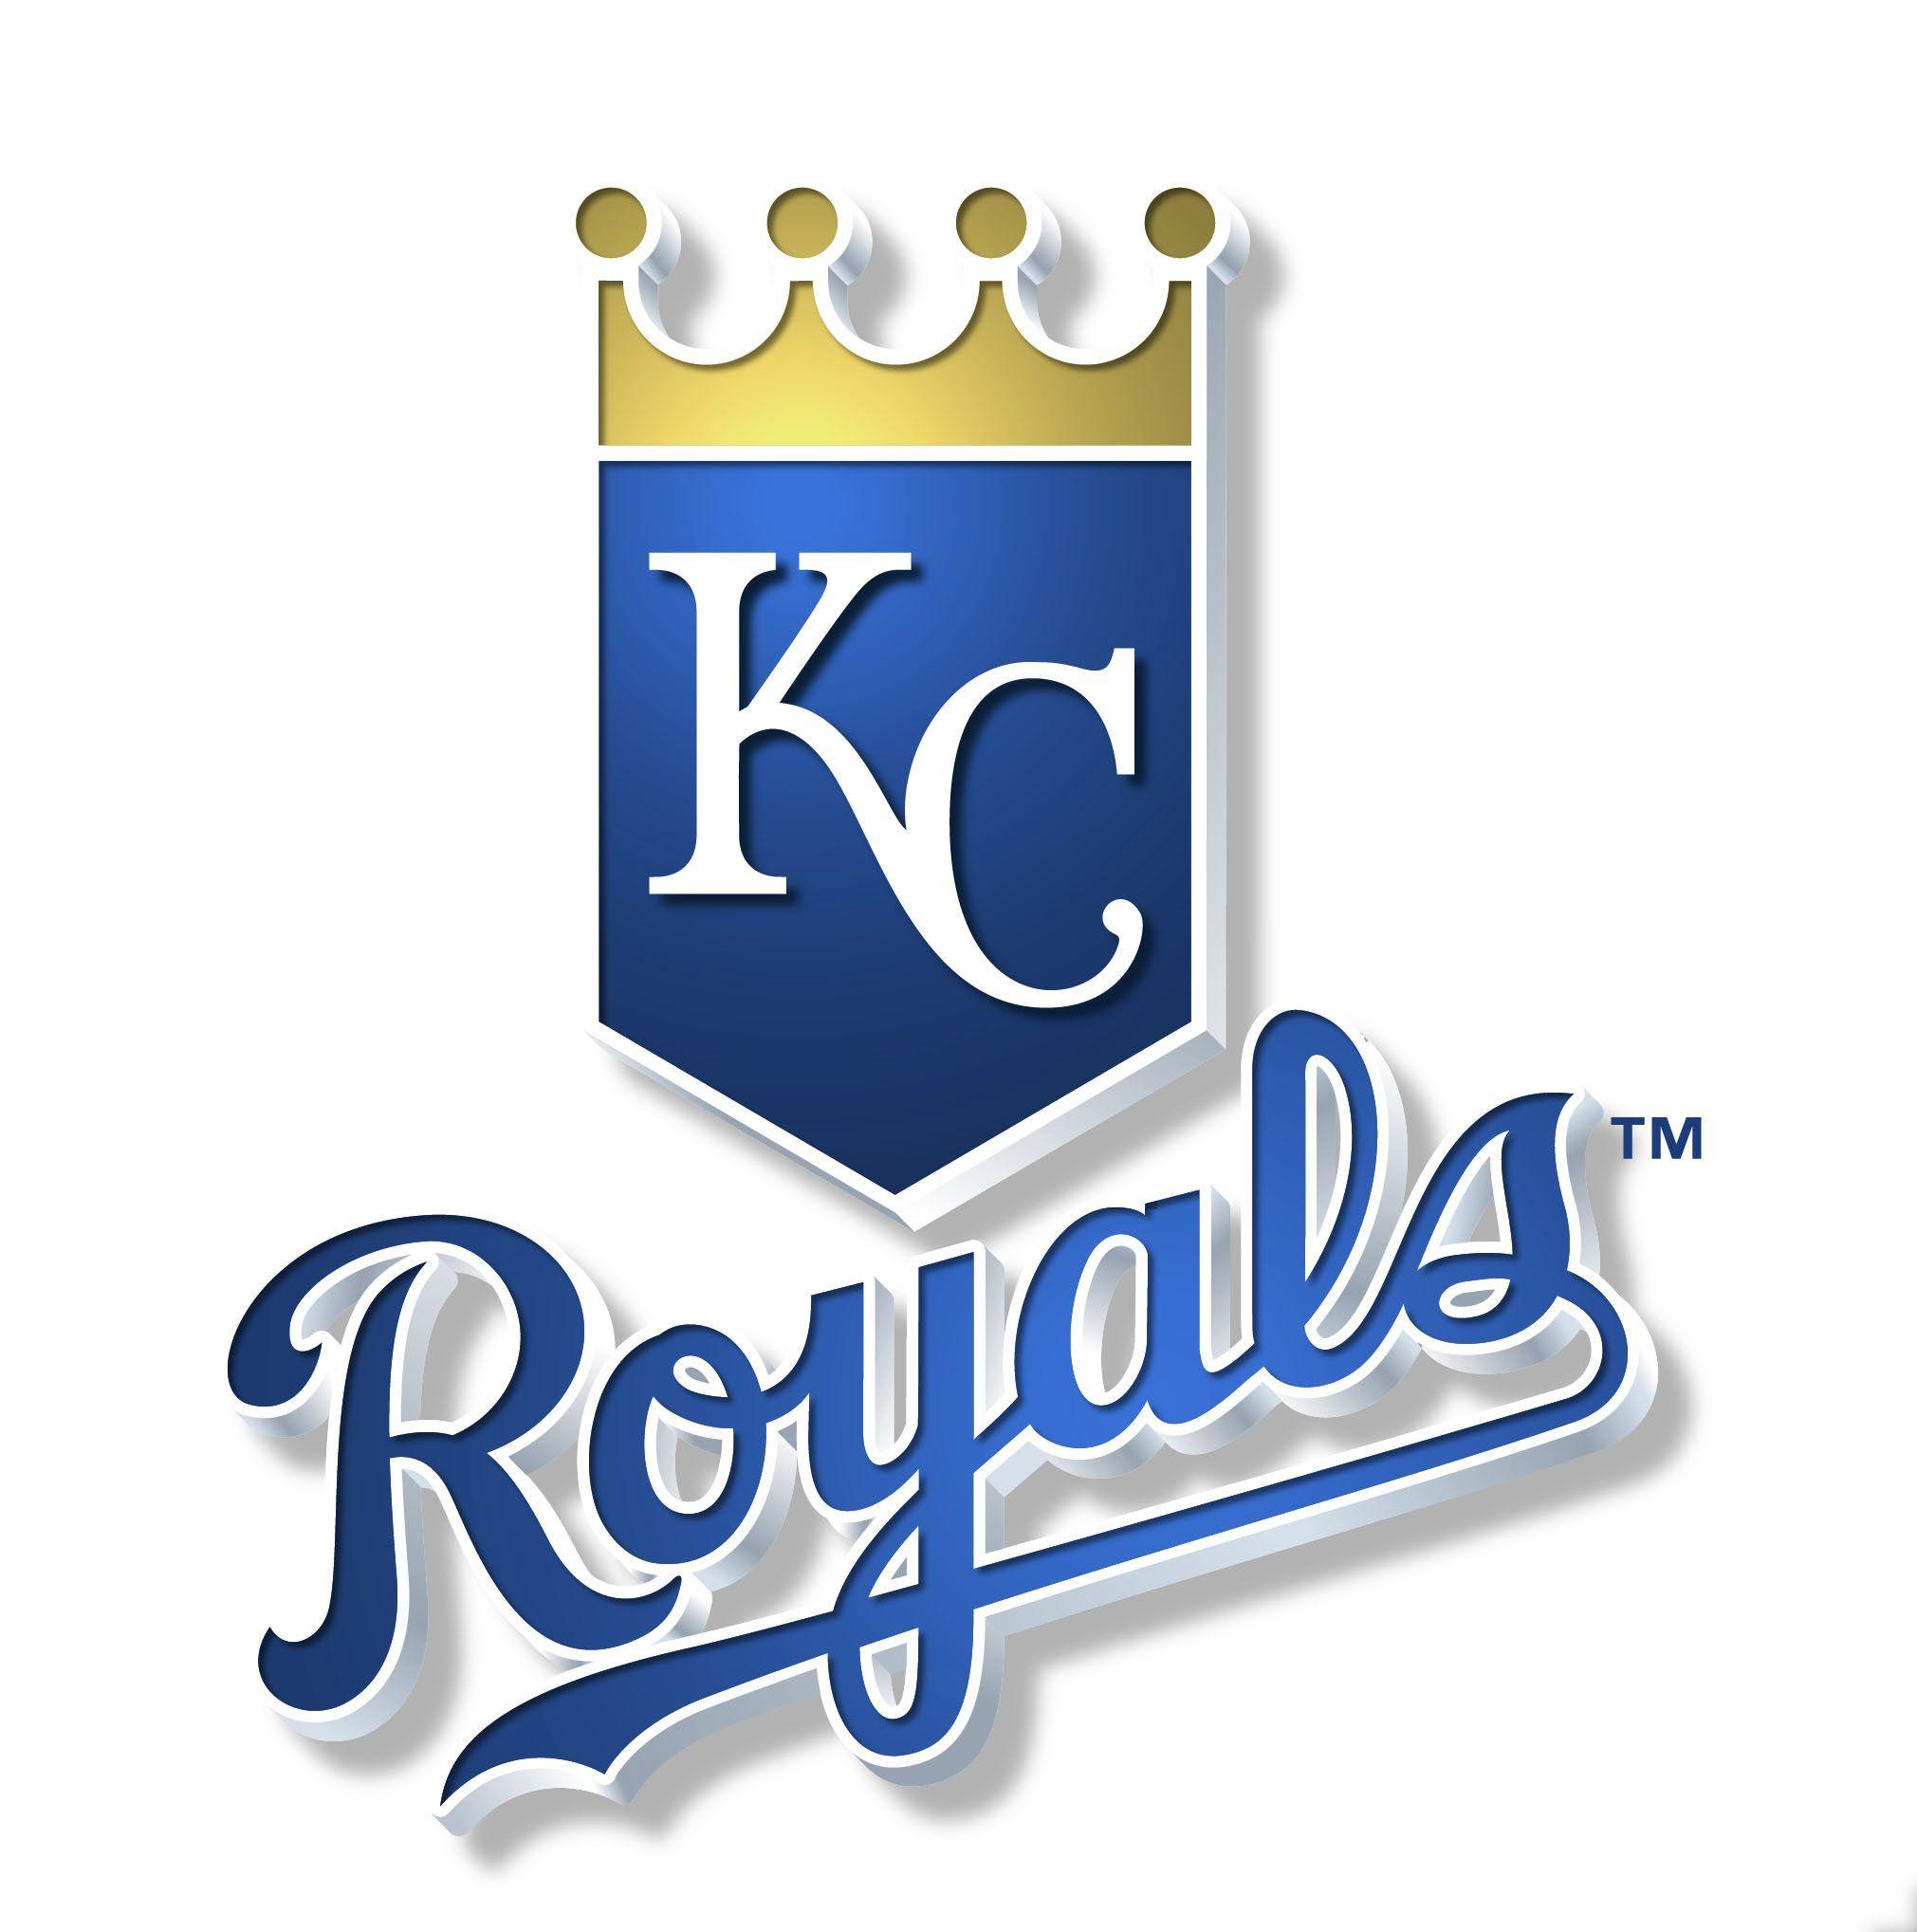 Royals Logo Kansas City Royals Logo Kansas City Kansas City Royals